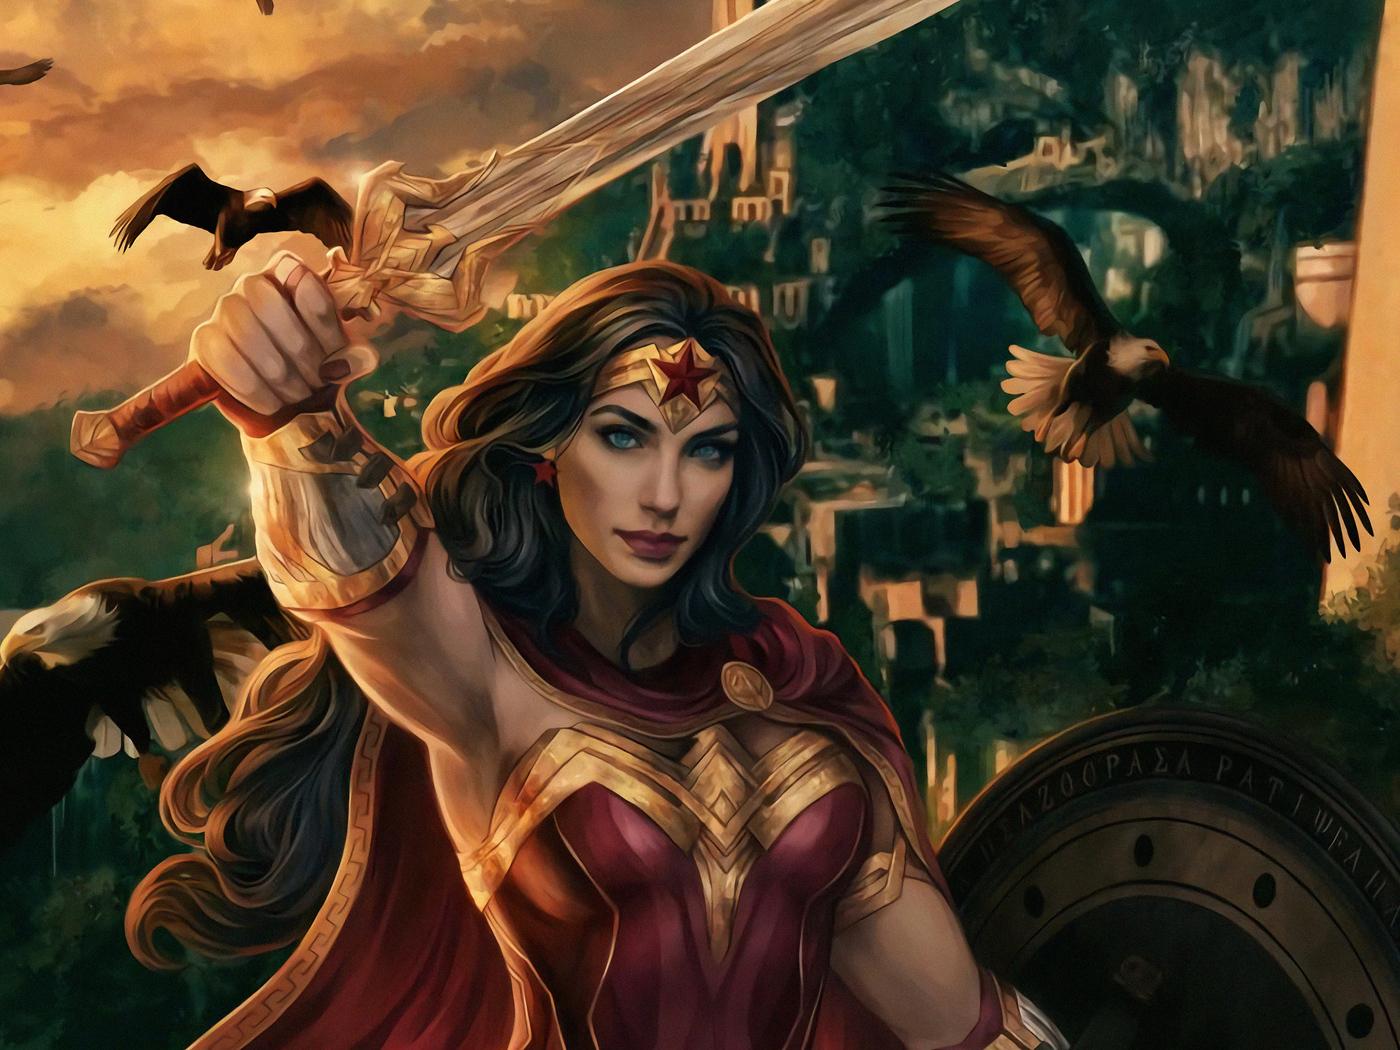 wonder-woman-real-warrior-art-4k-04.jpg